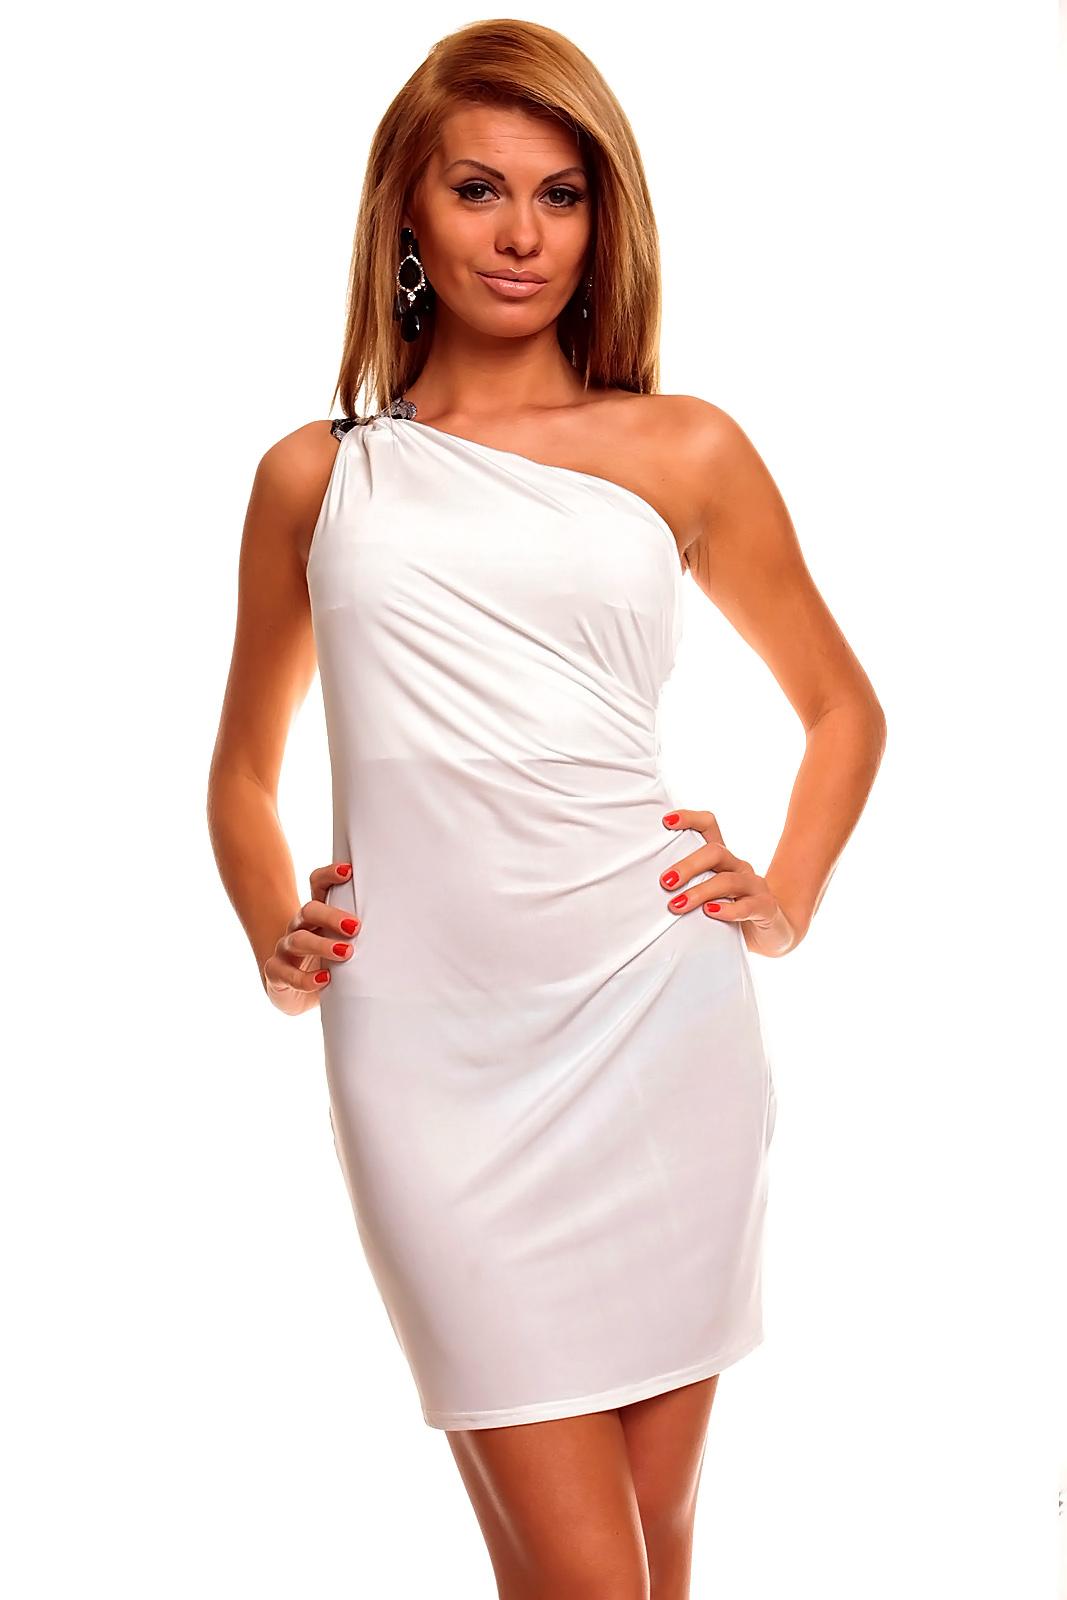 Mayaadi dámské přiléhavé šaty - bílé empty d8dfdede20